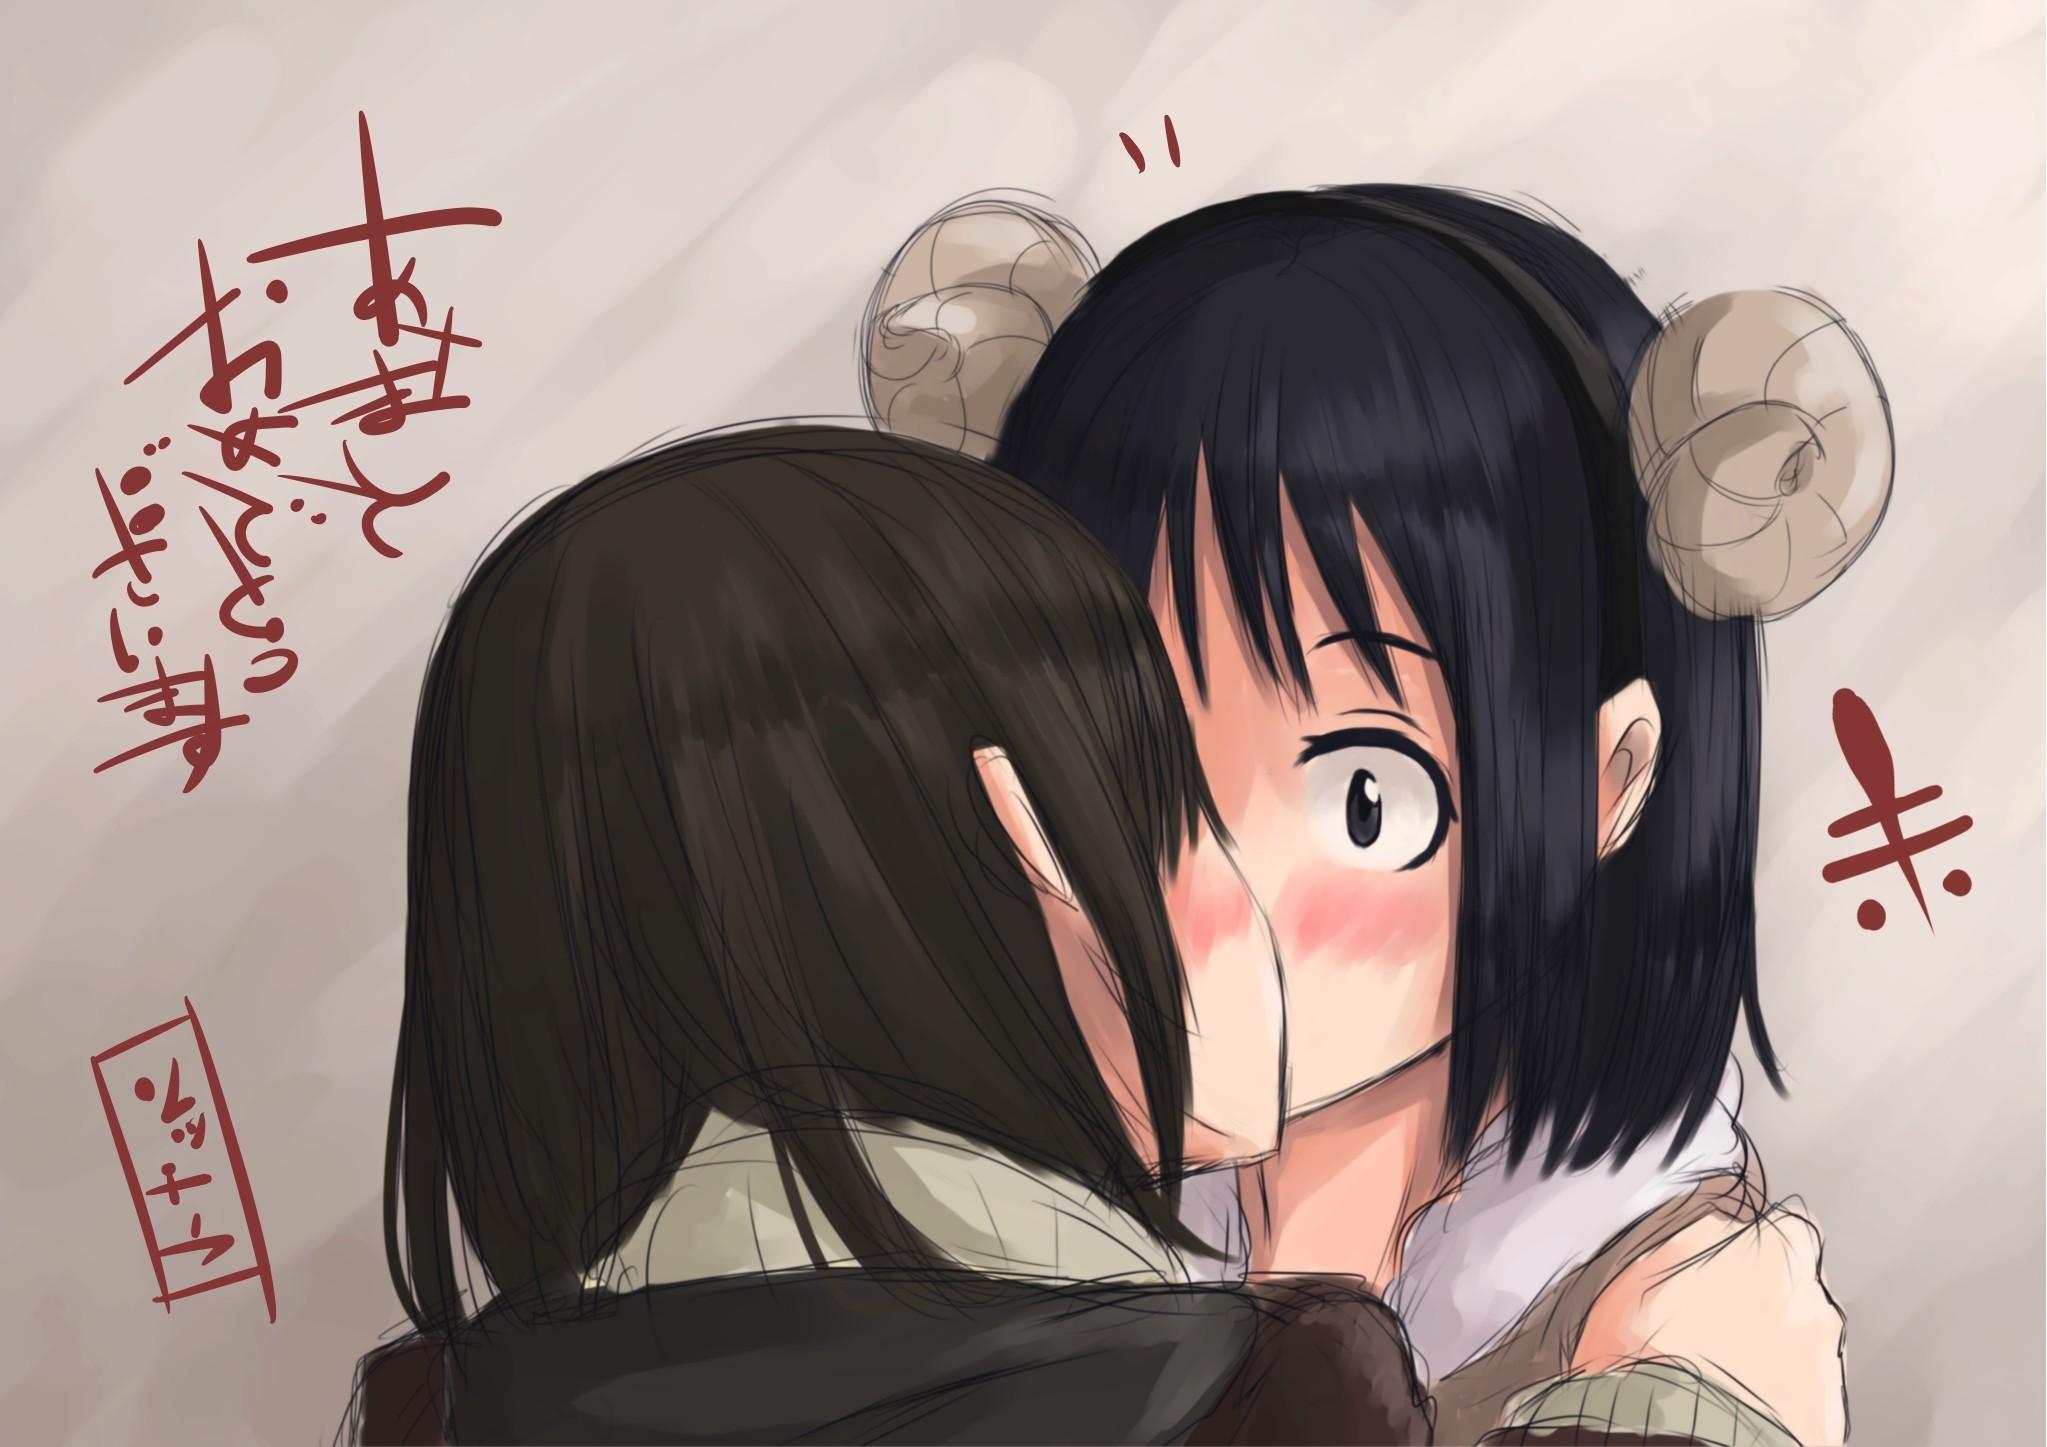 Wallpaper Yuri kuma arashi, Anime, Couple, Kiss